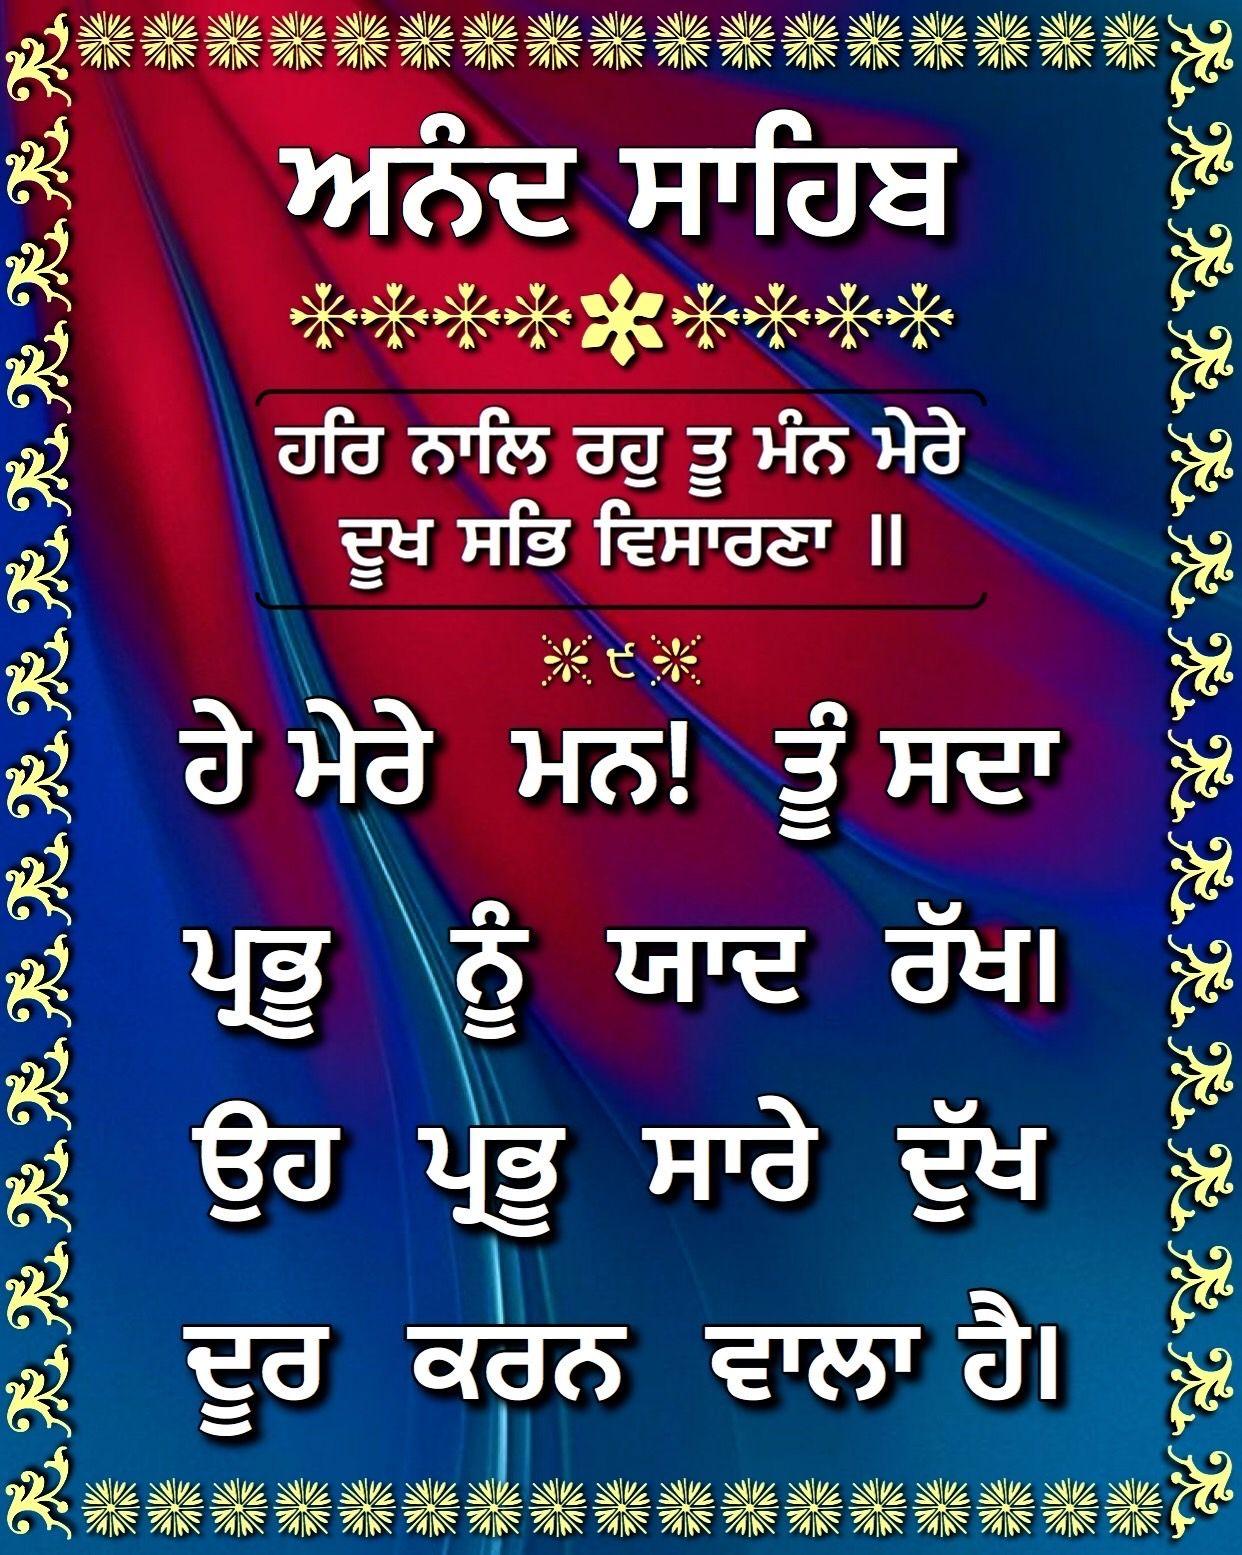 Pin on Gurudwara Hemkund Sahib